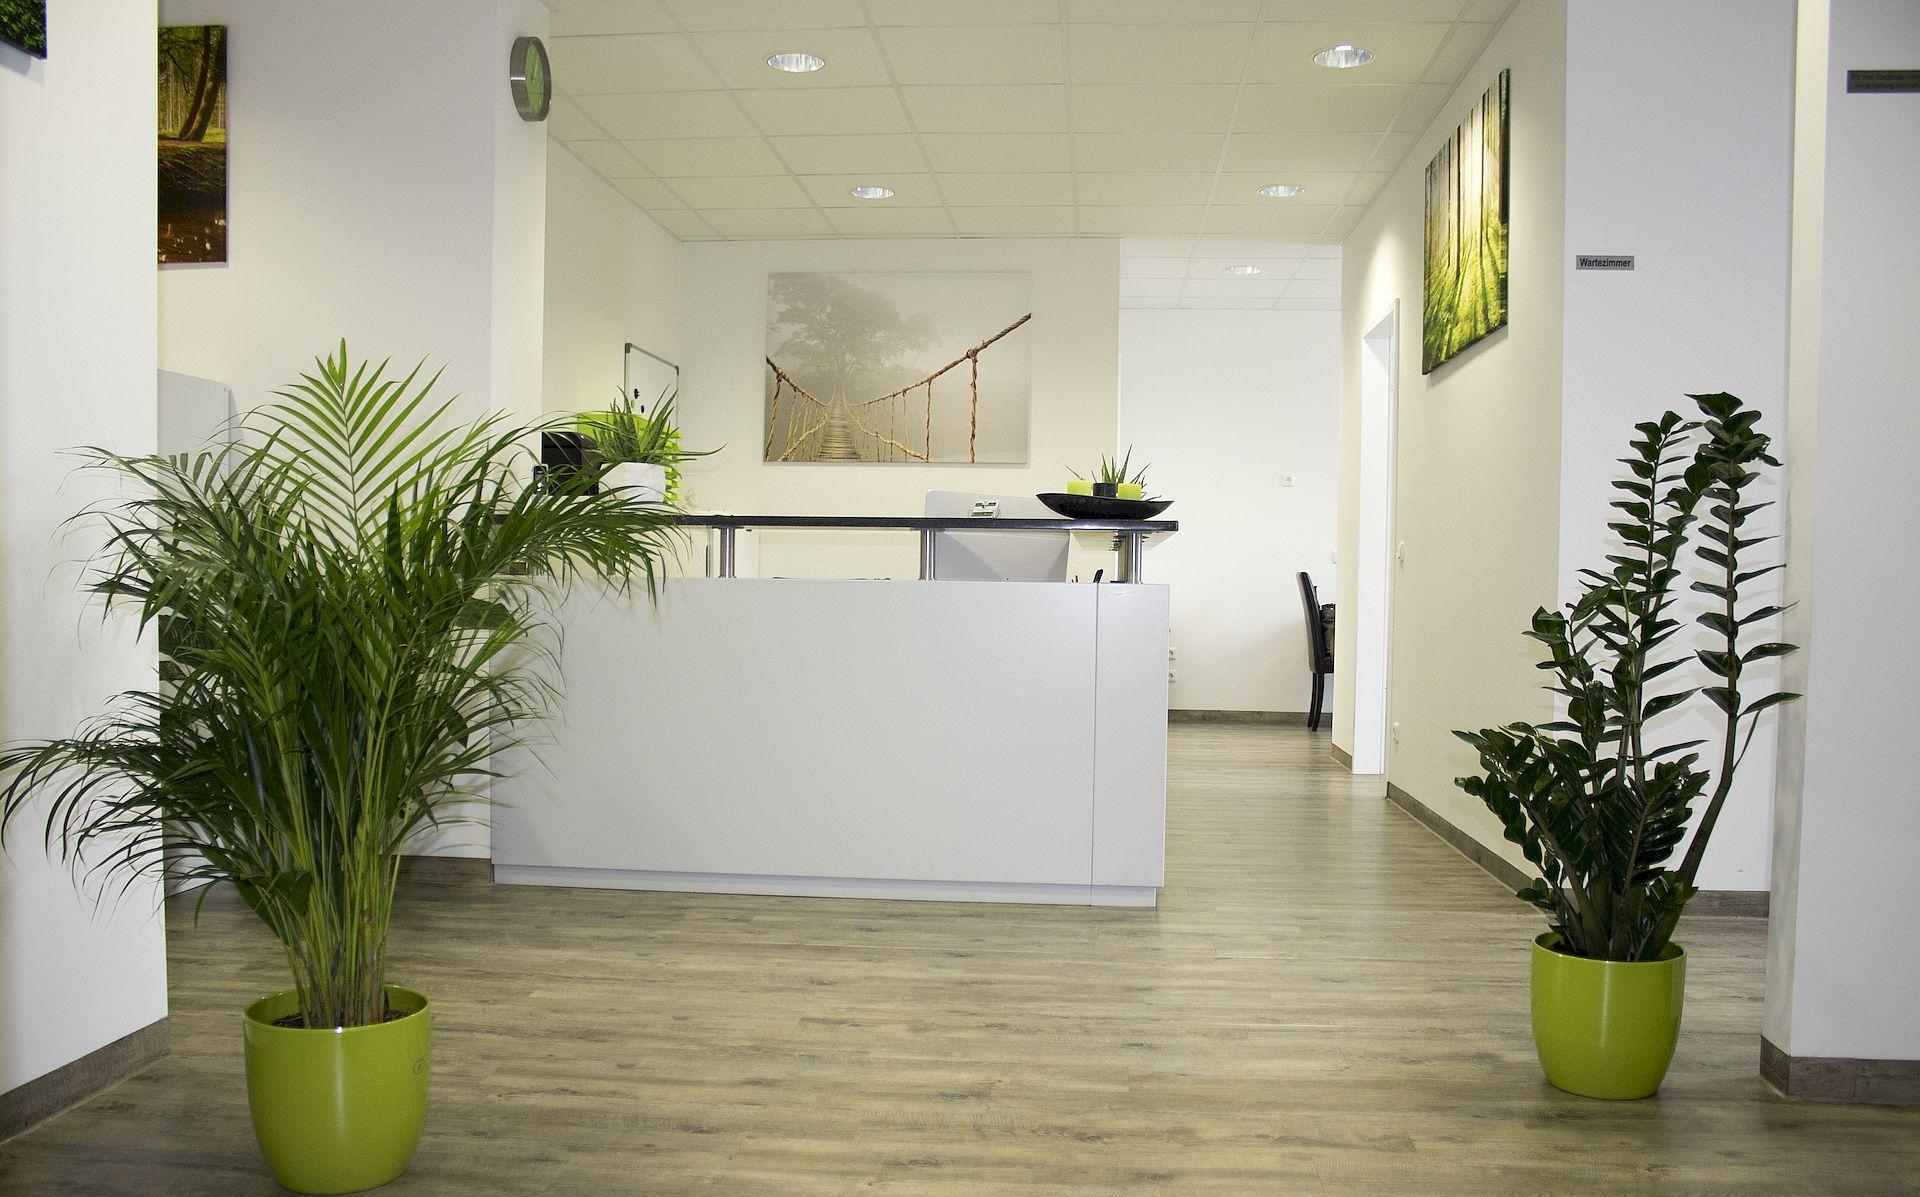 Therapiezentrum-gartencarre-physiotherapie-ergotherapie-fitness-ernährungsberatung-Praxis